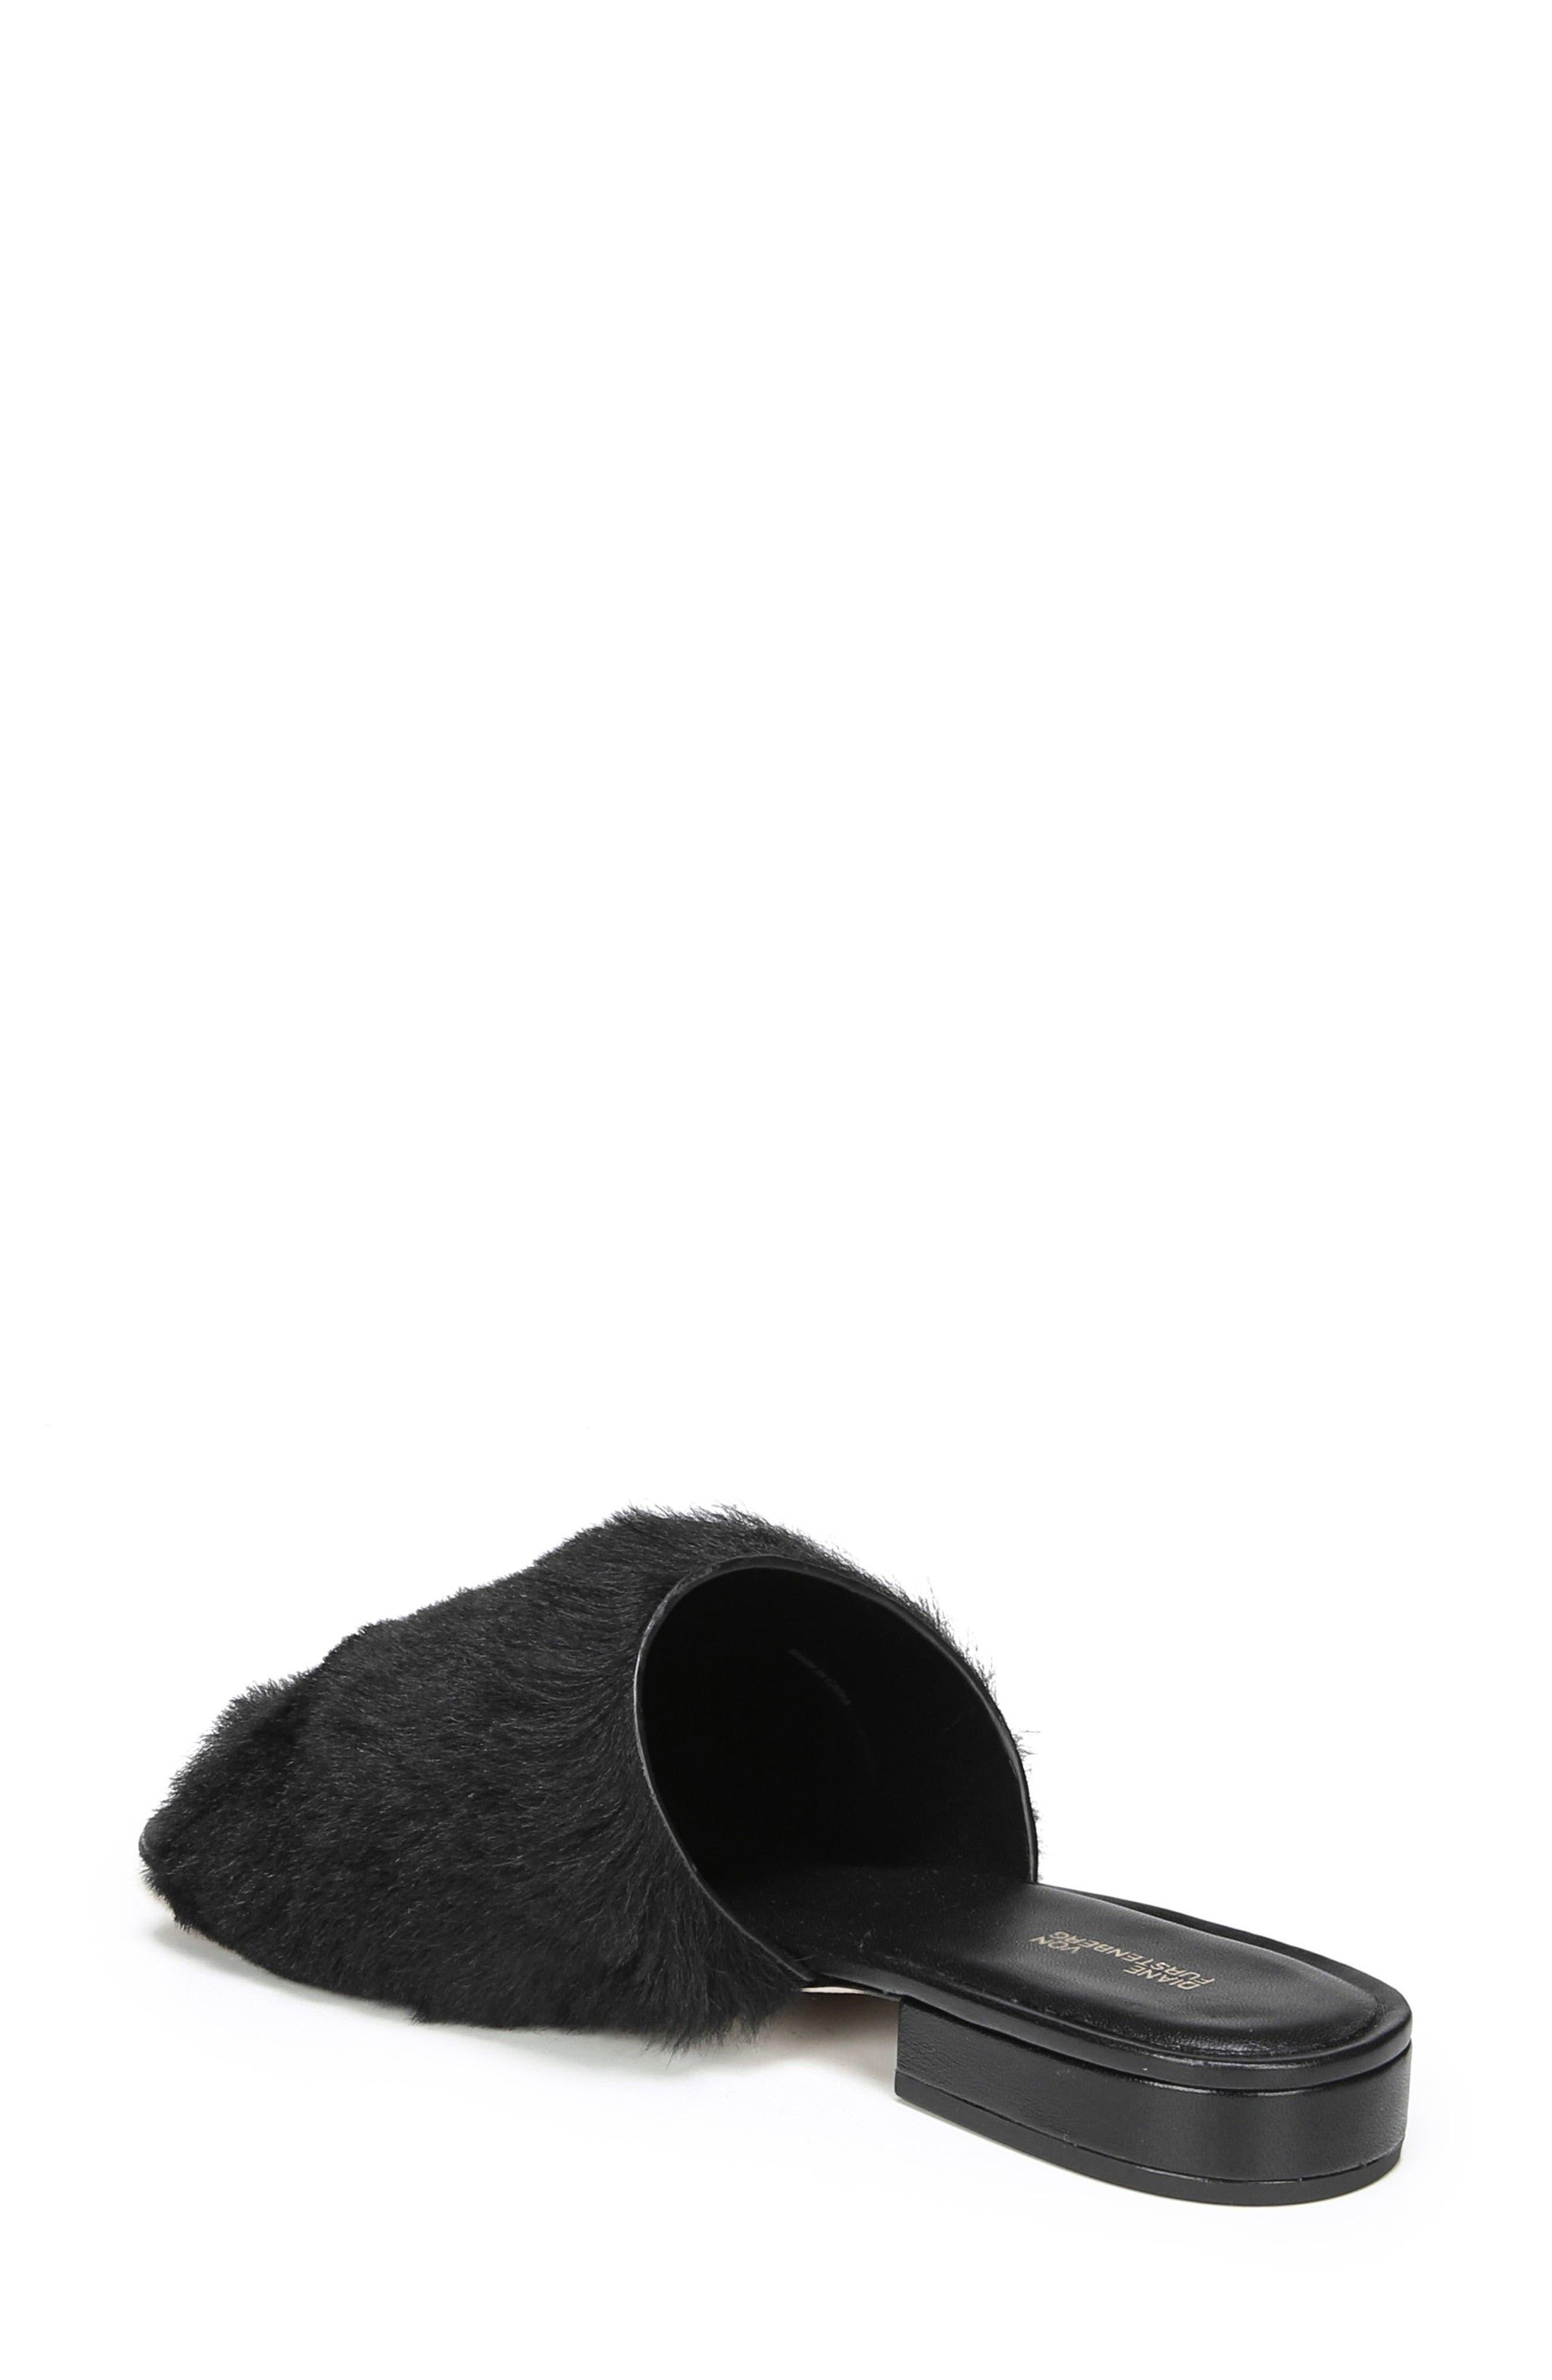 Alternate Image 2  - Diane von Furstenberg Santi Genuine Shearling Slide Sandal (Women)